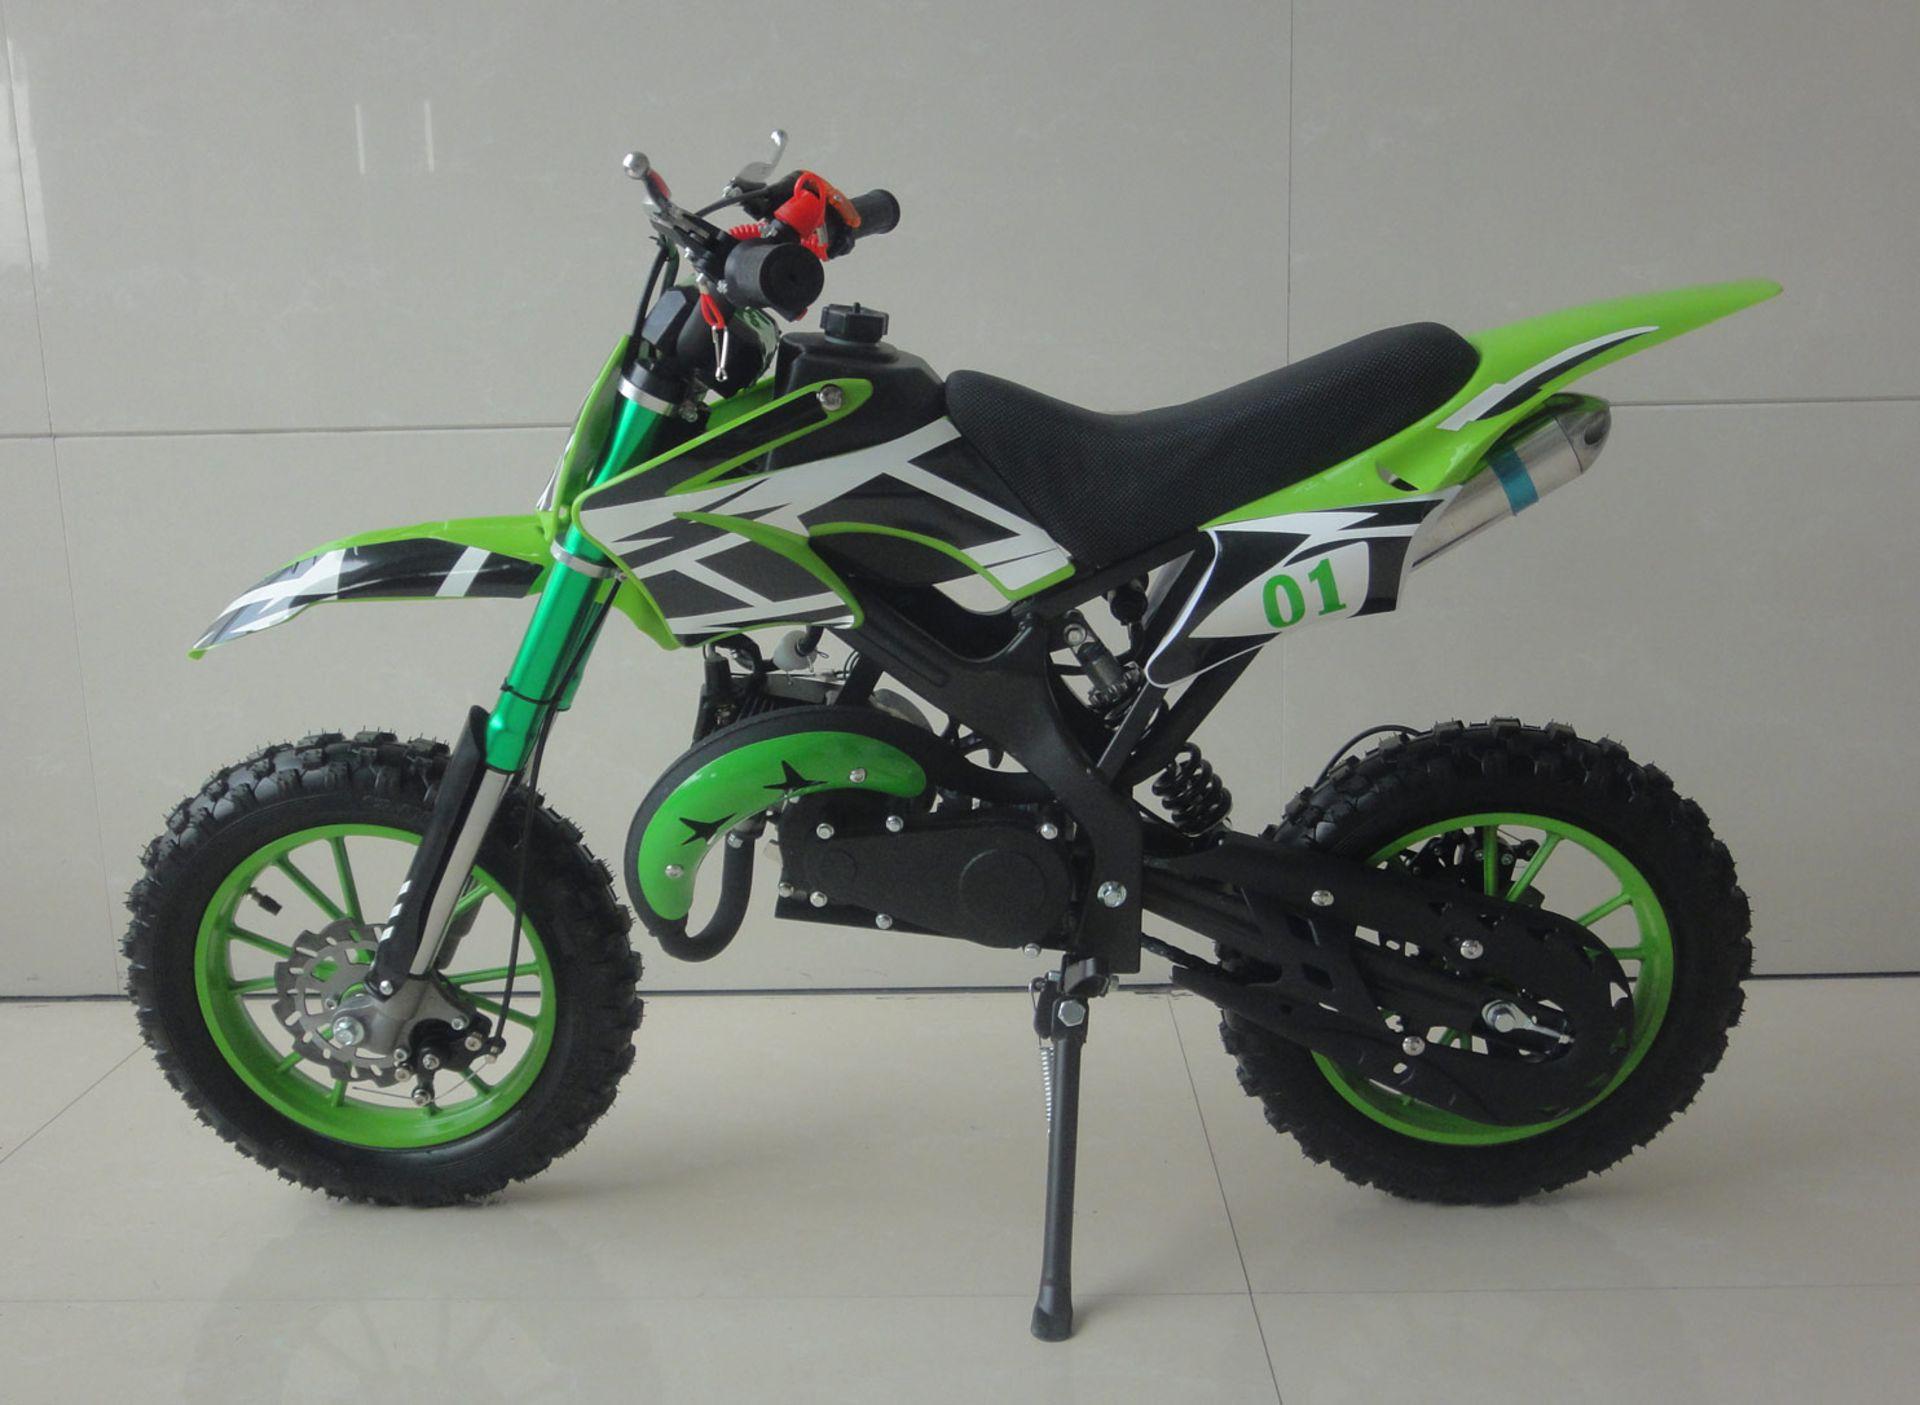 + VAT Brand New 49cc Falcon Mini Dirt Bike - Full Front & Rear Suspension - Disc Brakes - Easy Pull - Image 2 of 6